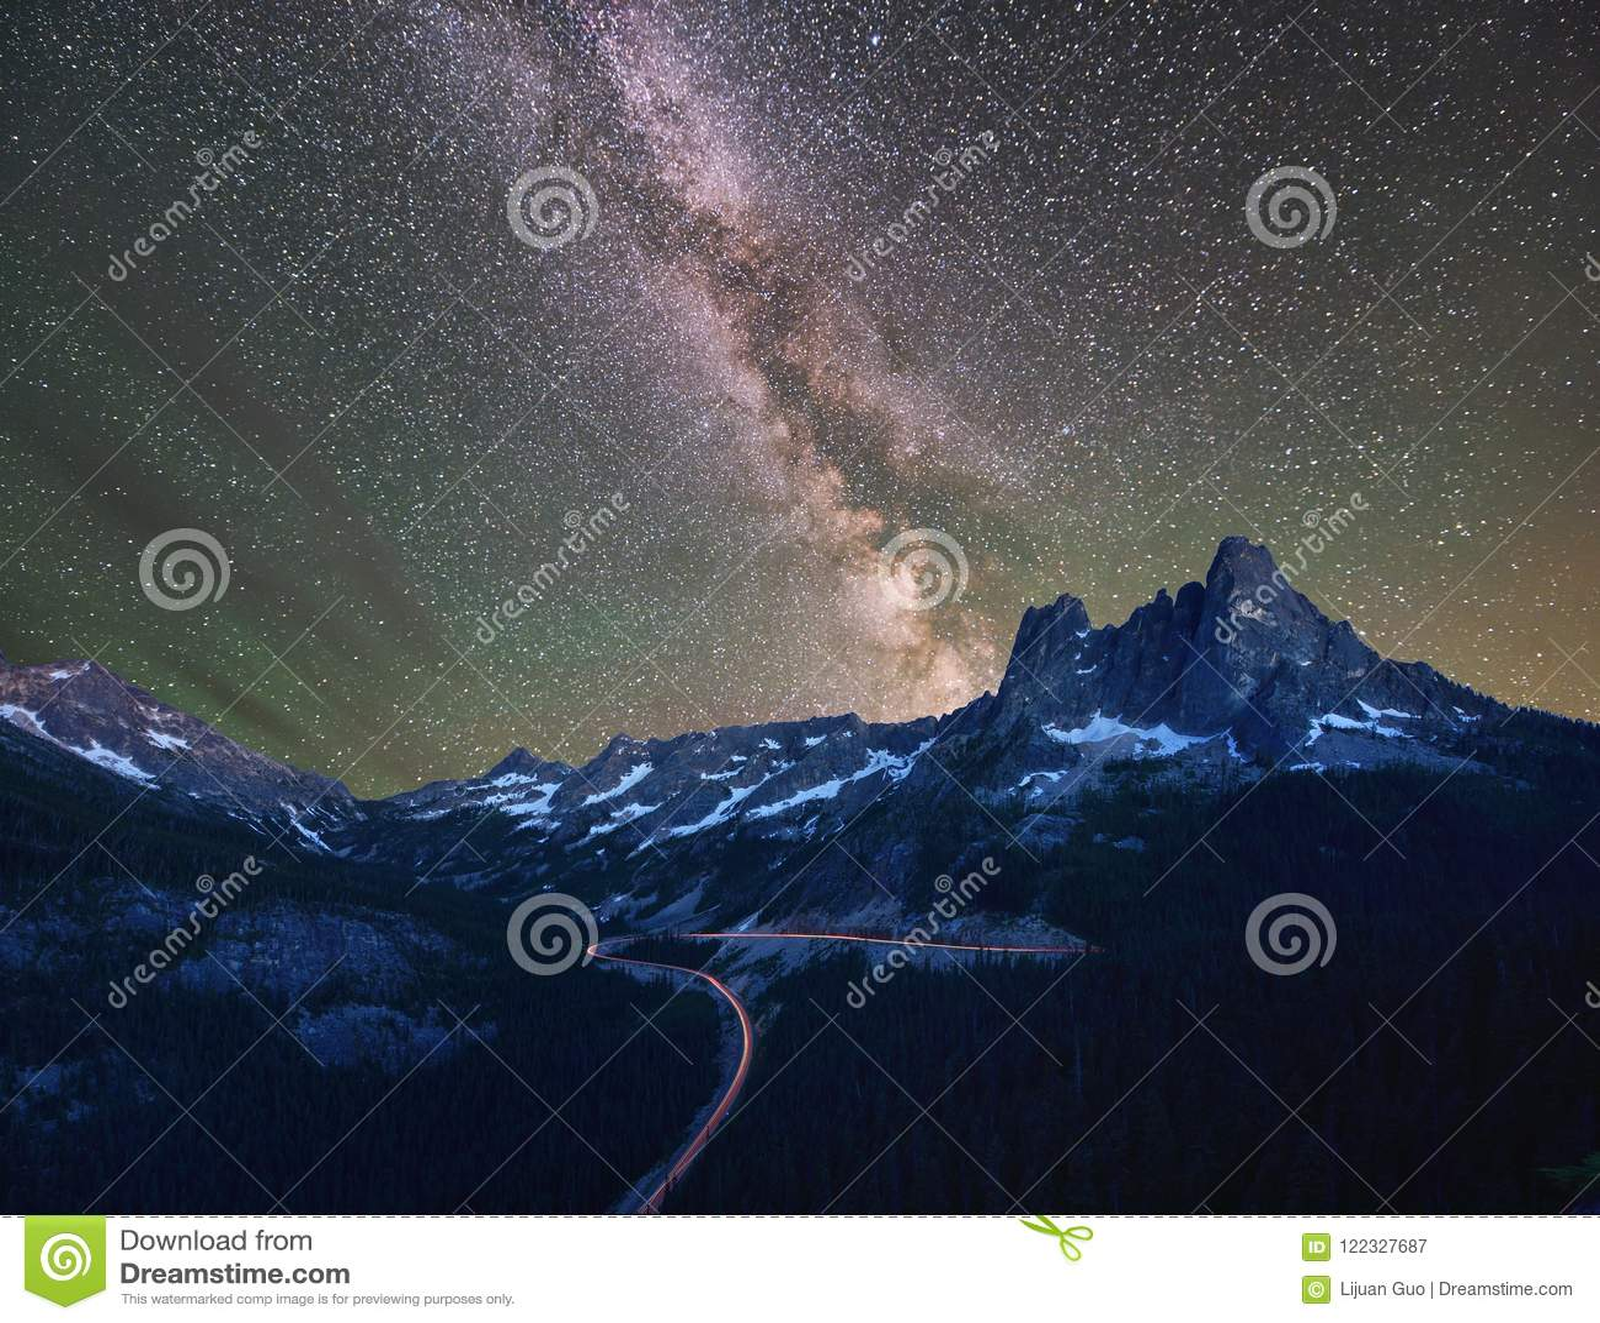 Liberty Bell and Kangaroo Ridge with Milky Way and Mars